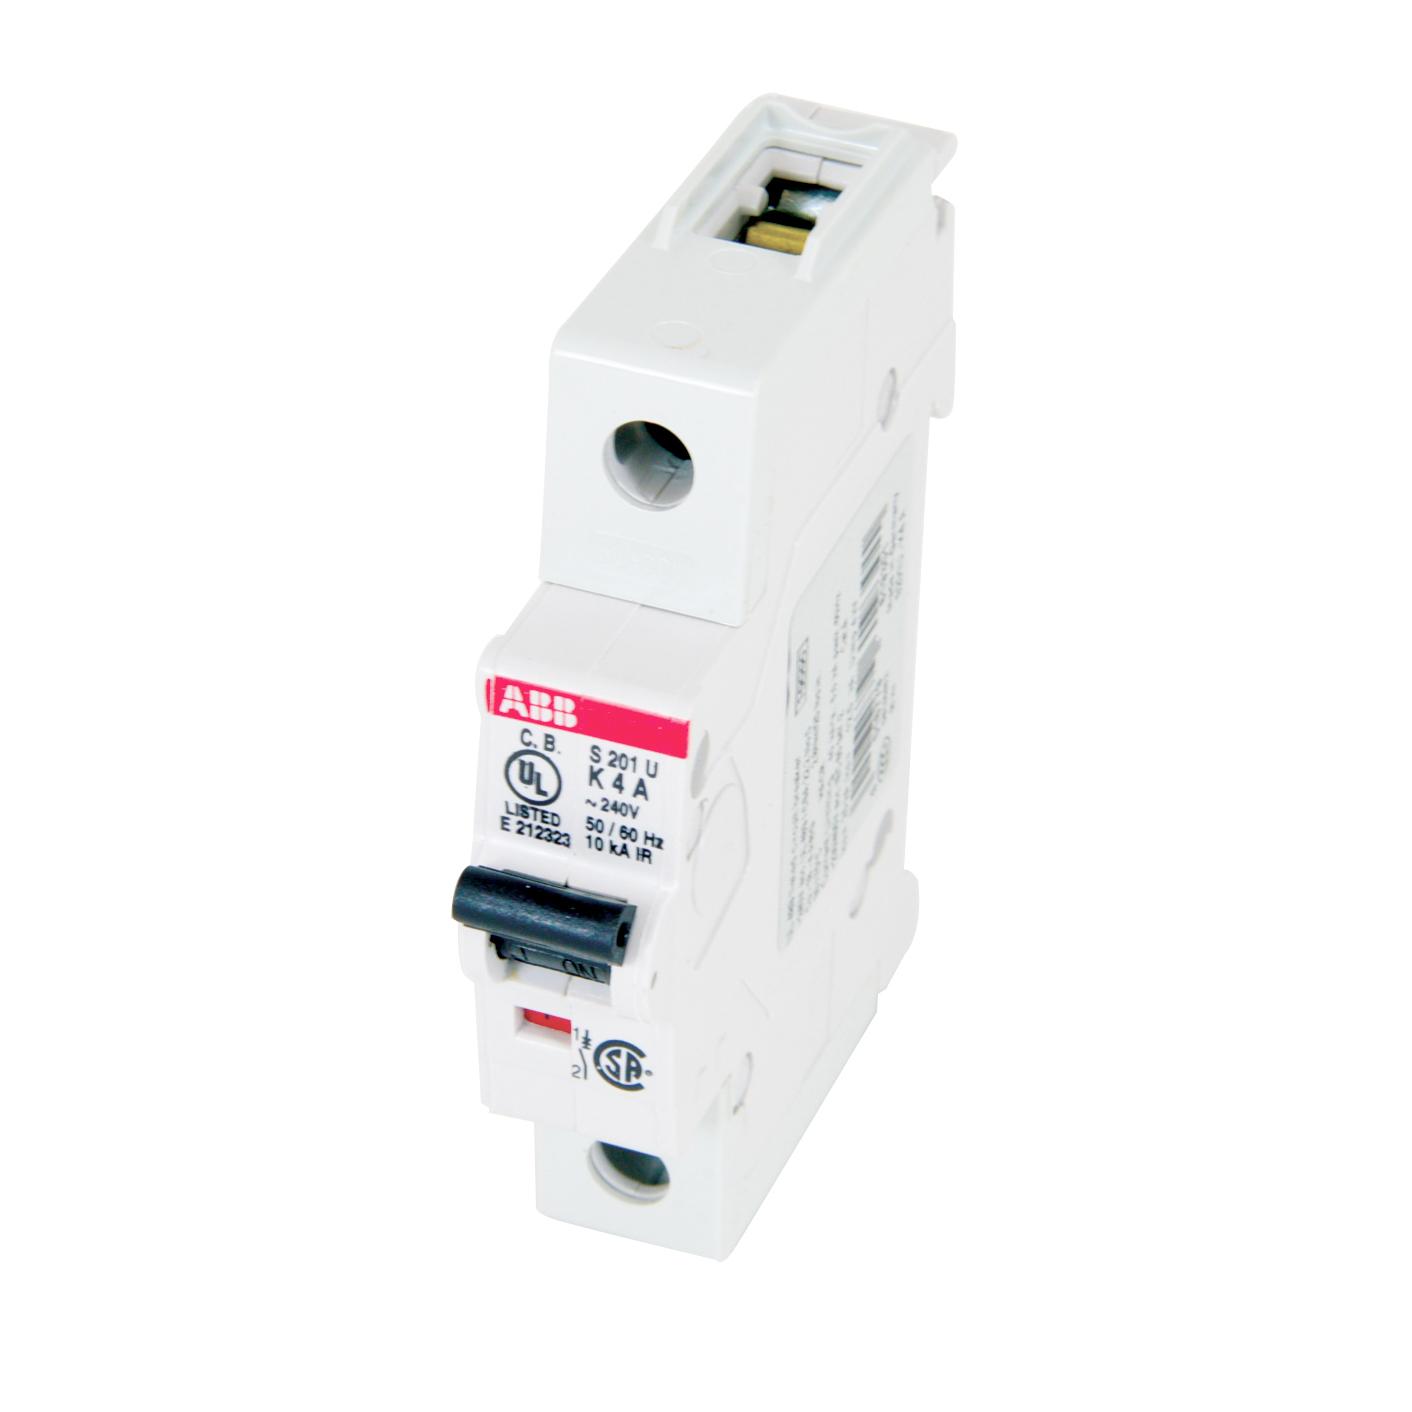 Thomas & Betts S201U-K4 4 Amp Miniature Circuit Breaker